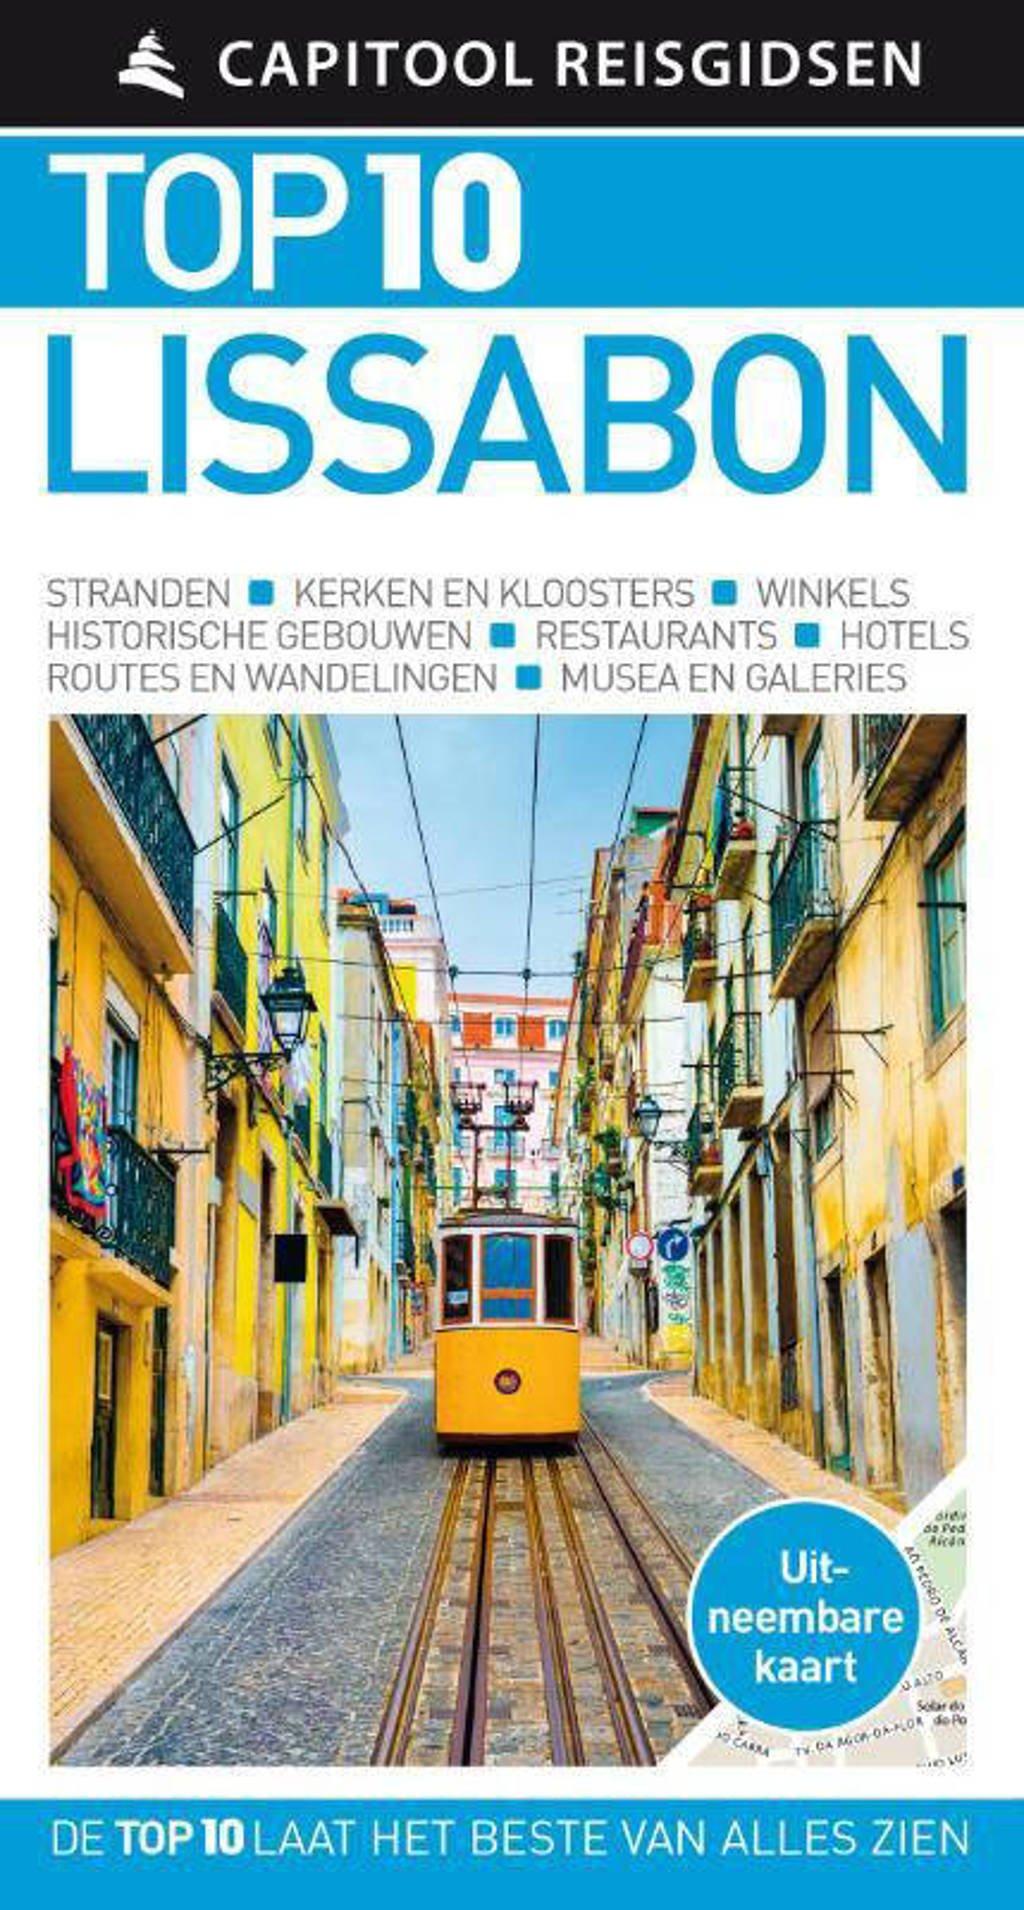 Capitool Reisgidsen Top 10: Lissabon - Tomas Tranaeus